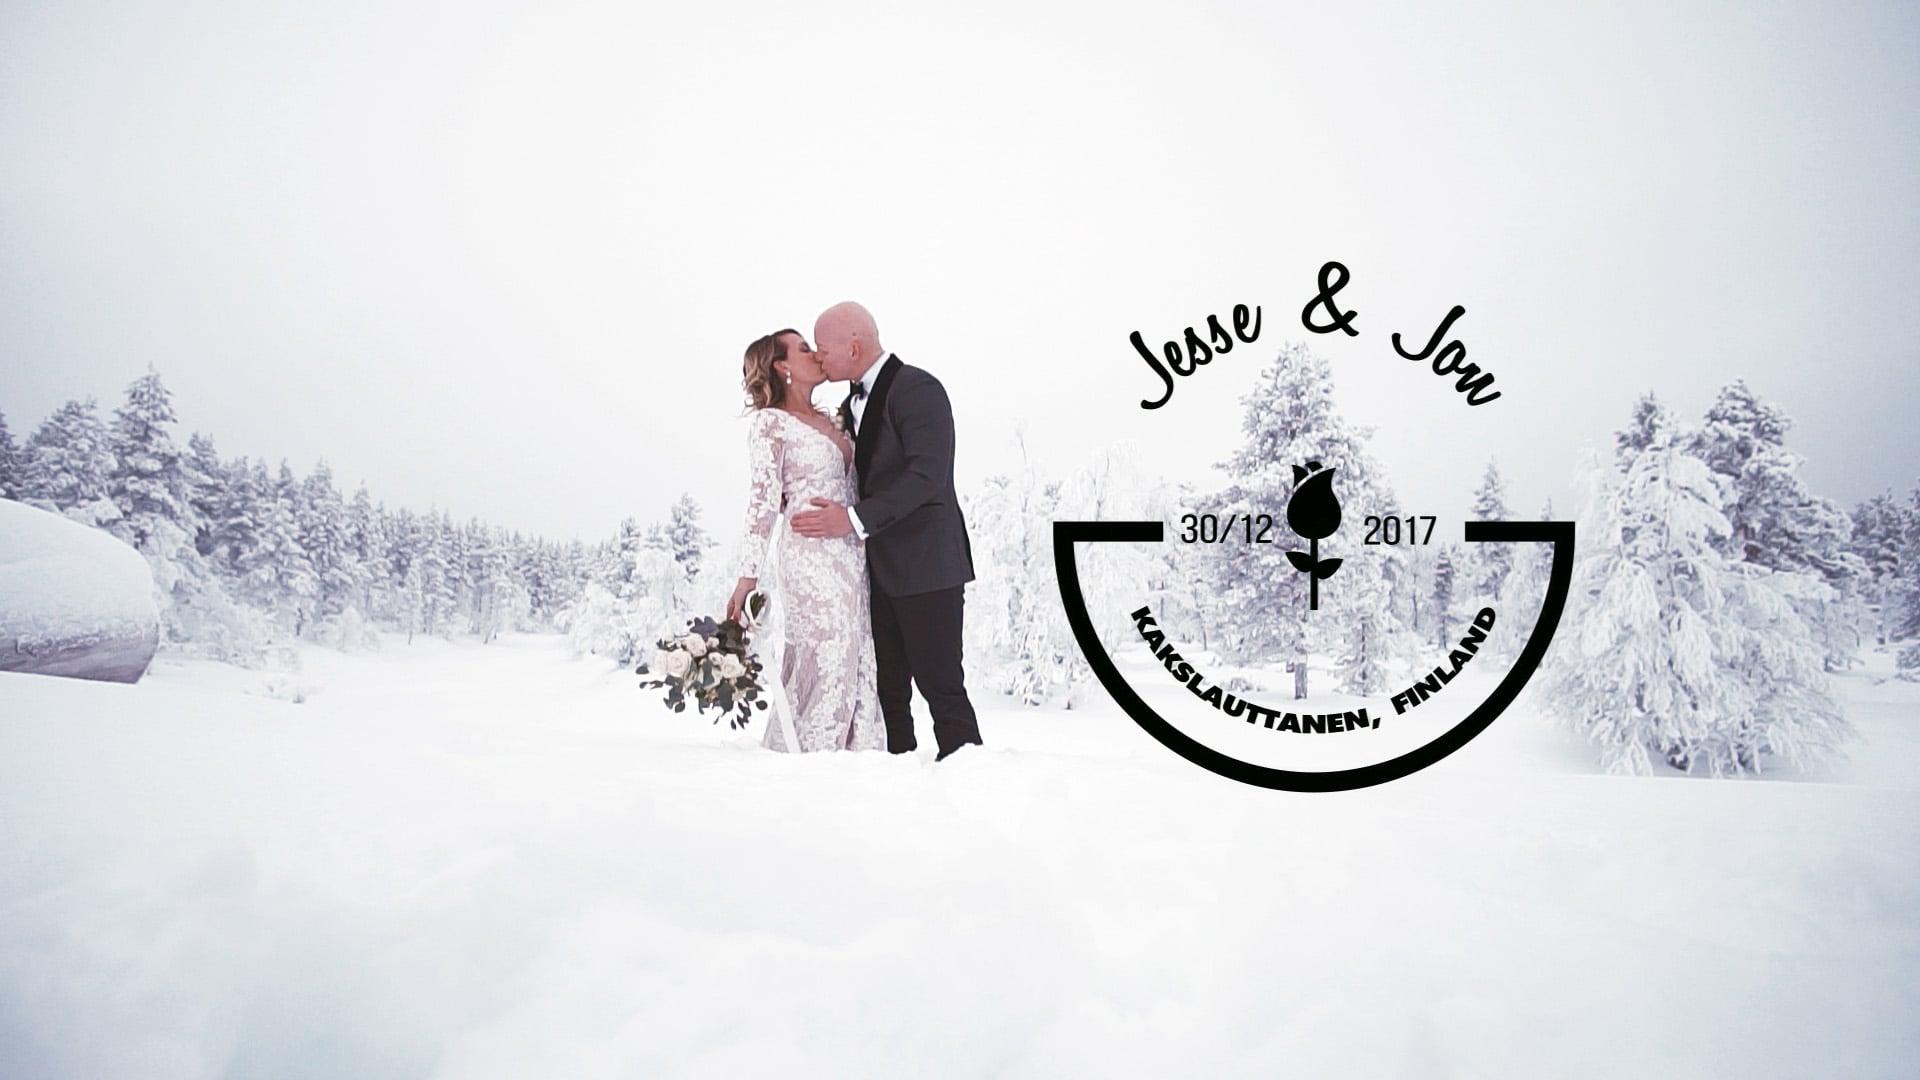 Jesse & Jon 2017 Wedding Highlights